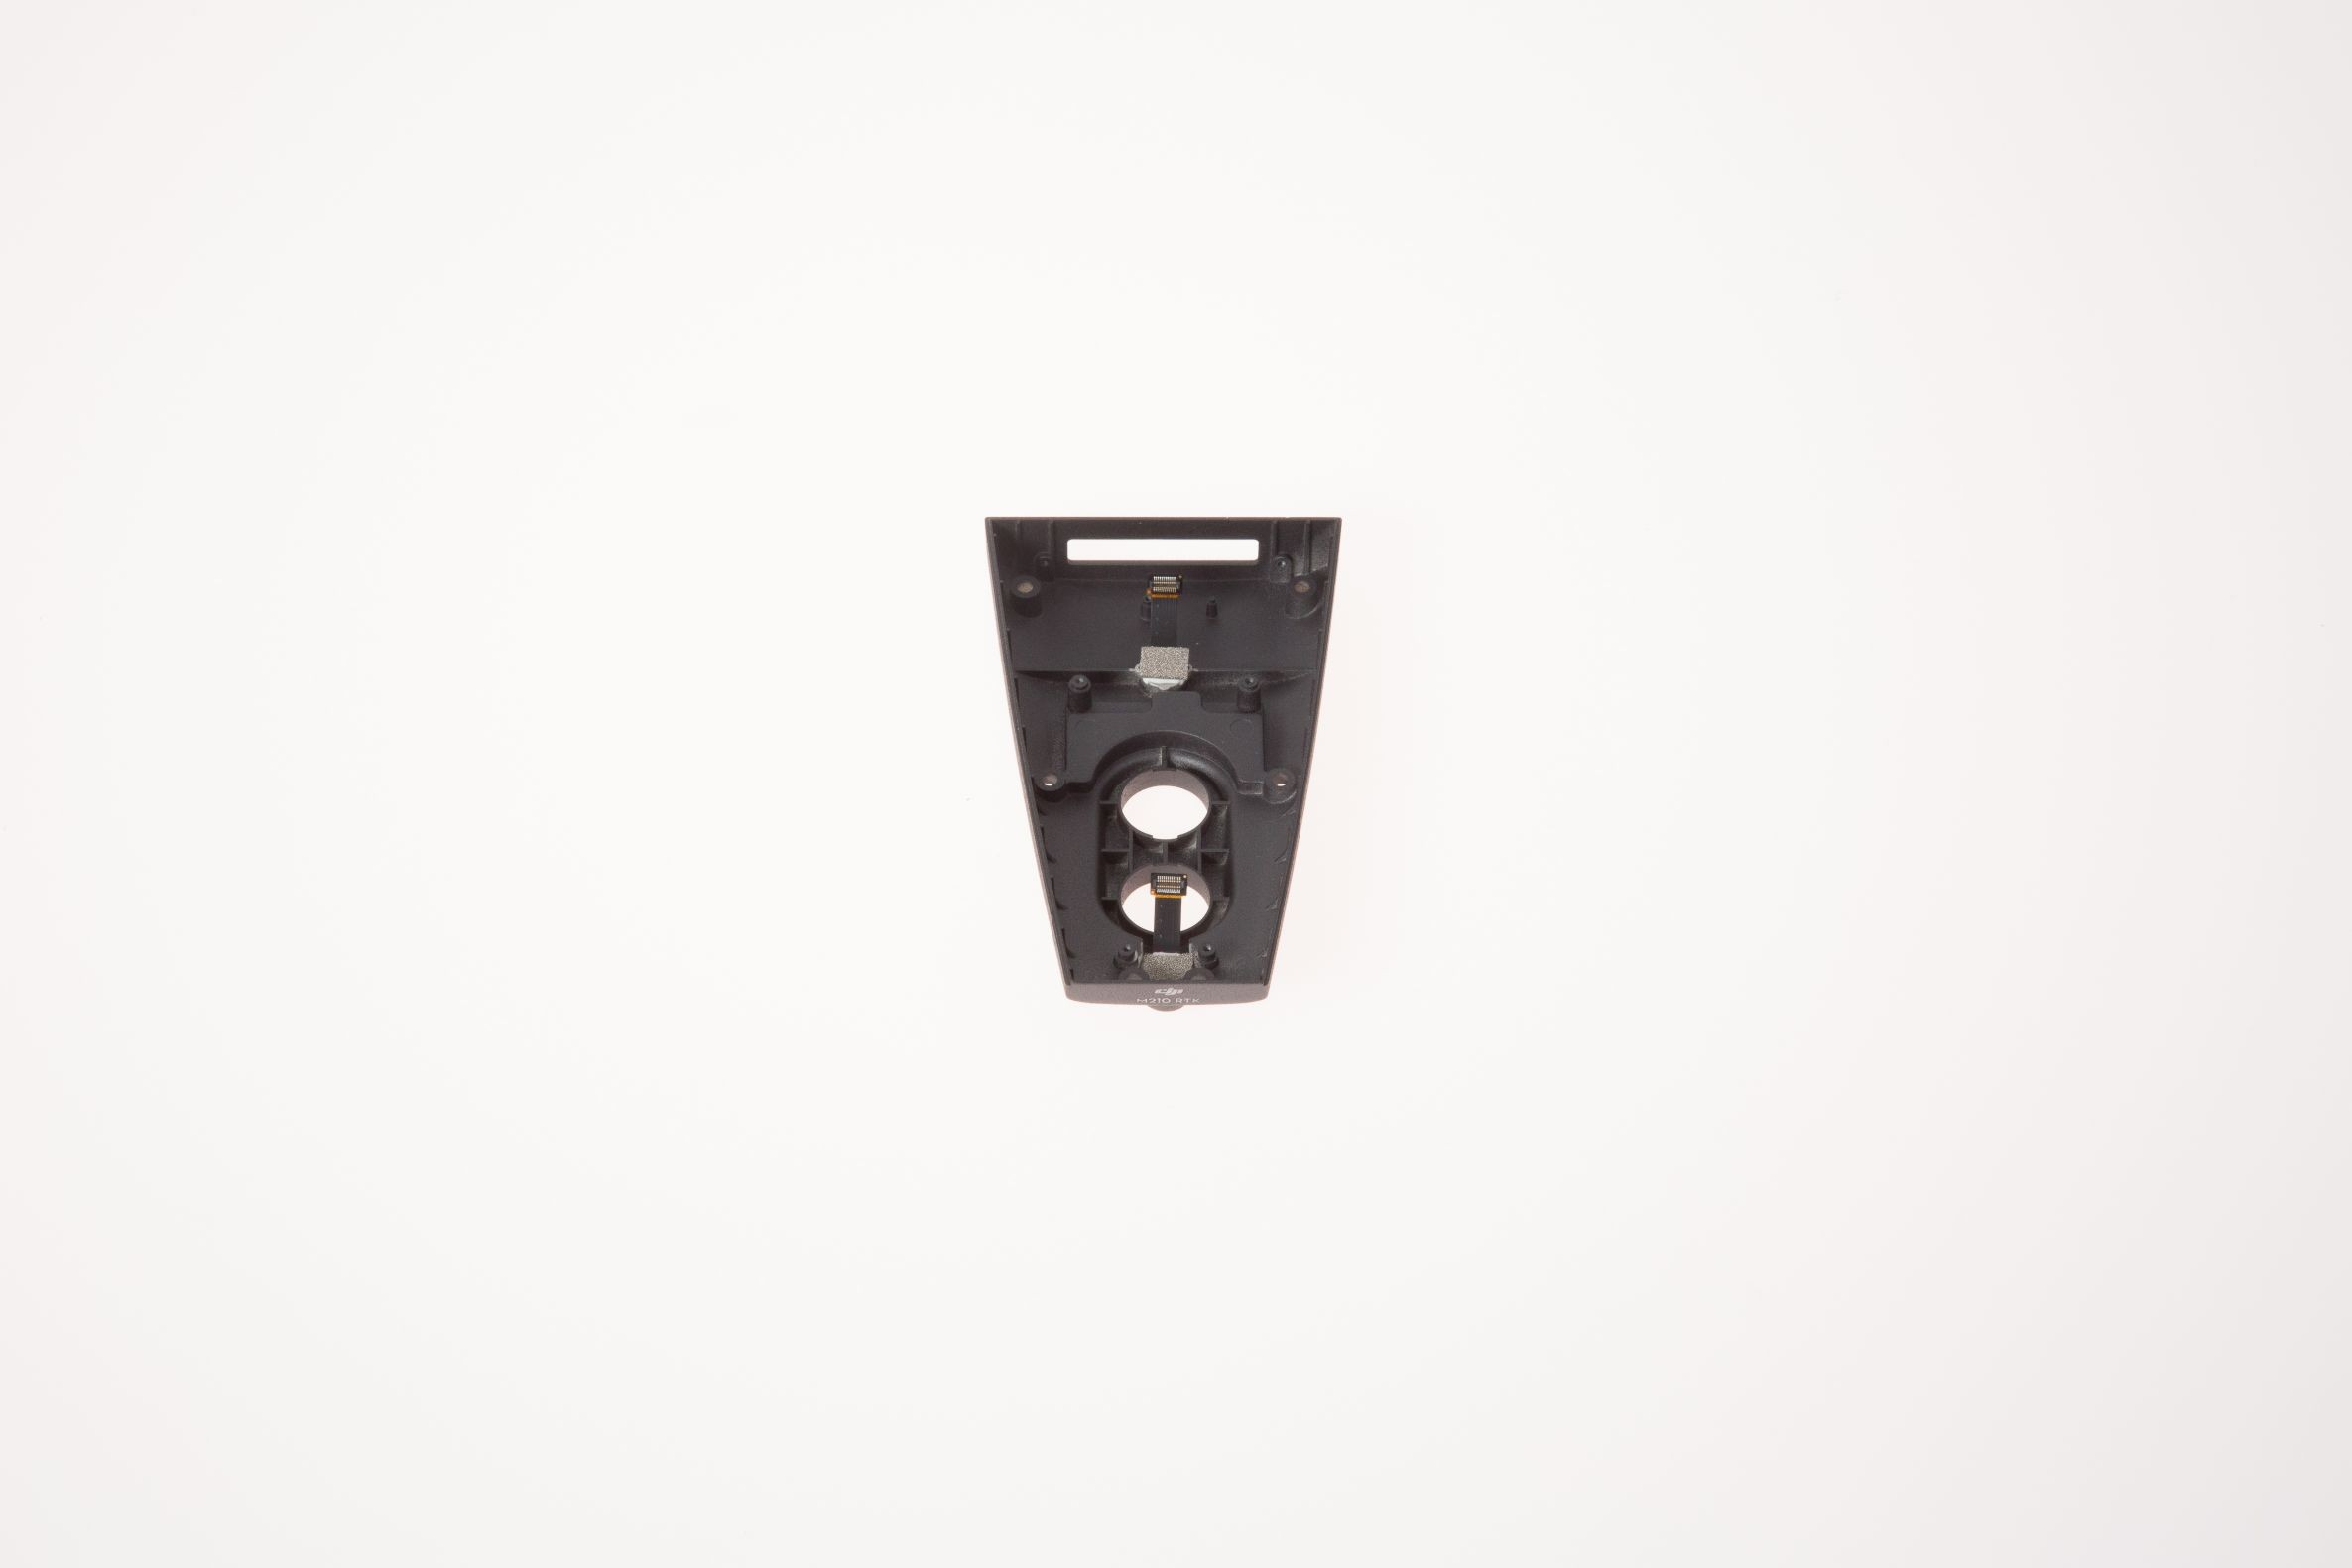 DJI Matrice 200 Battery Compartment Bottom Cover Module (M200)